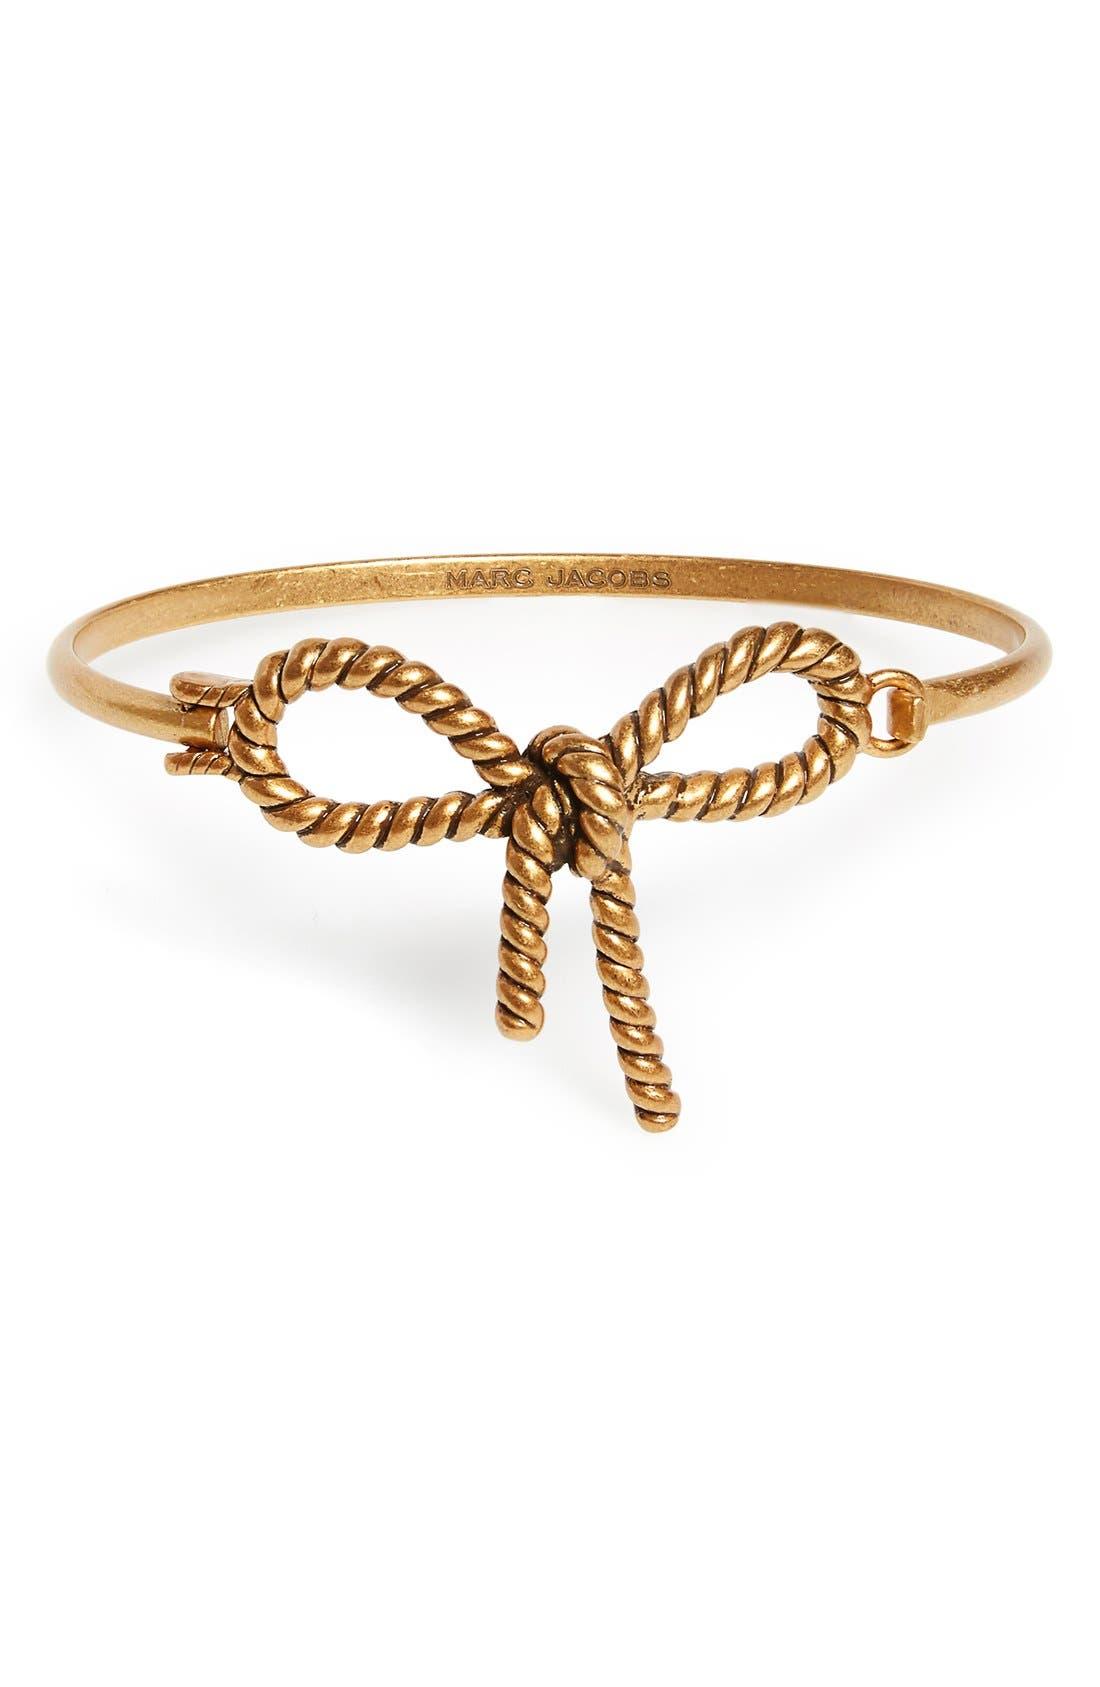 Alternate Image 1 Selected - MARC JACOBS Rope Bow Hinge Bracelet